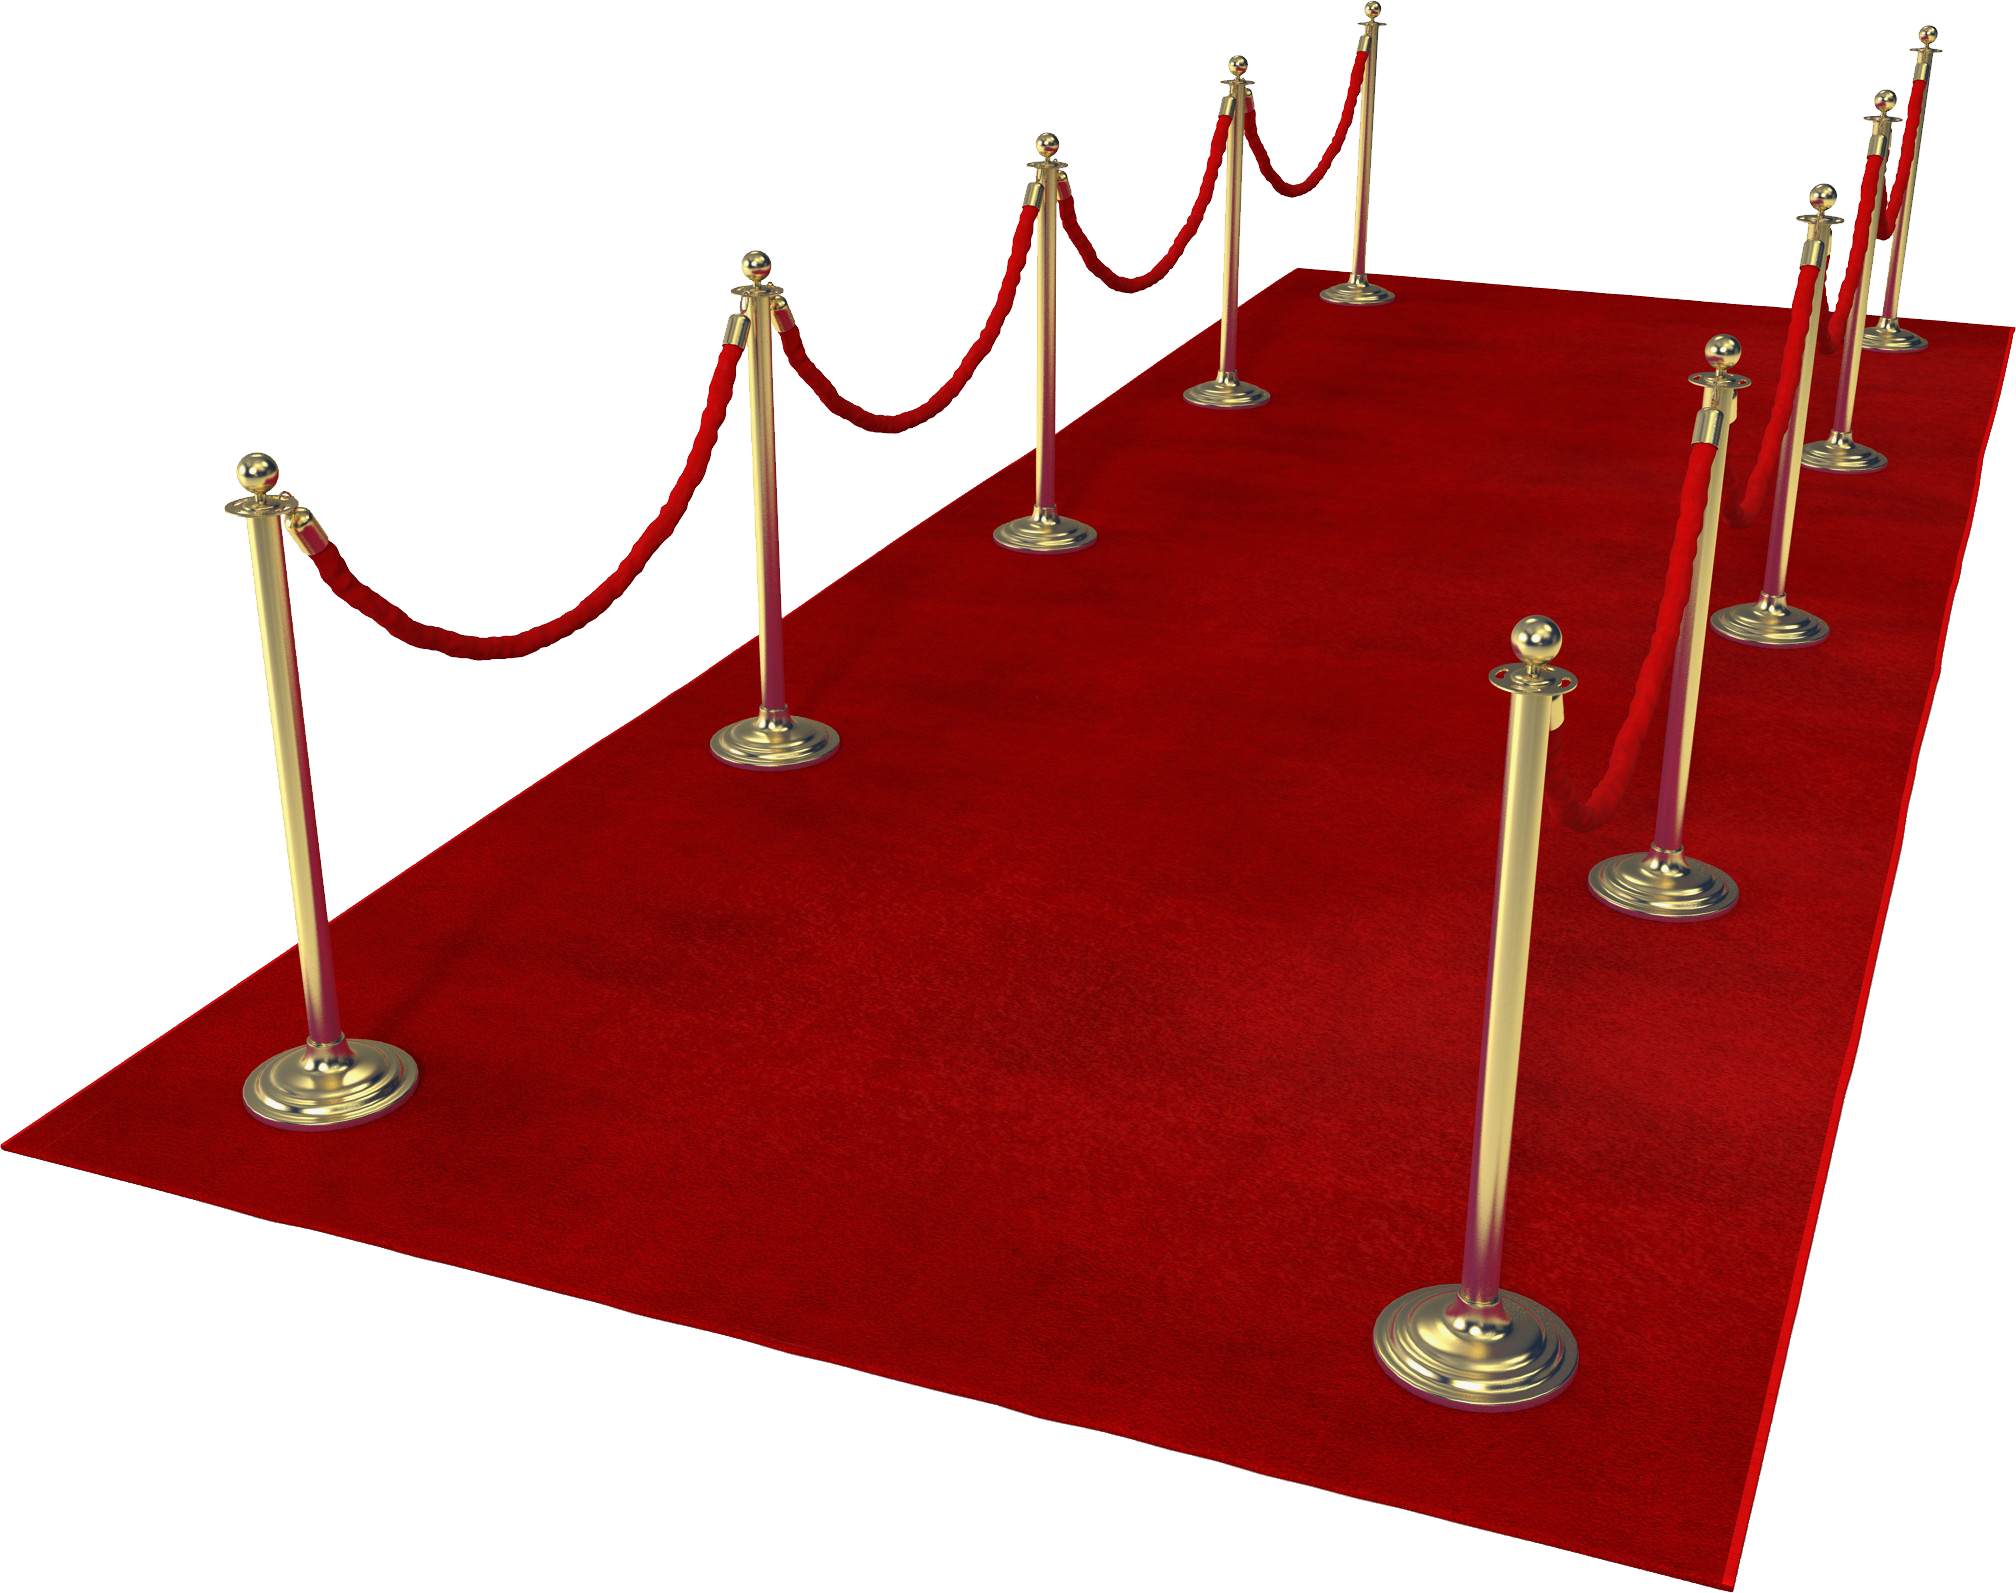 Red Carpet PNG Image